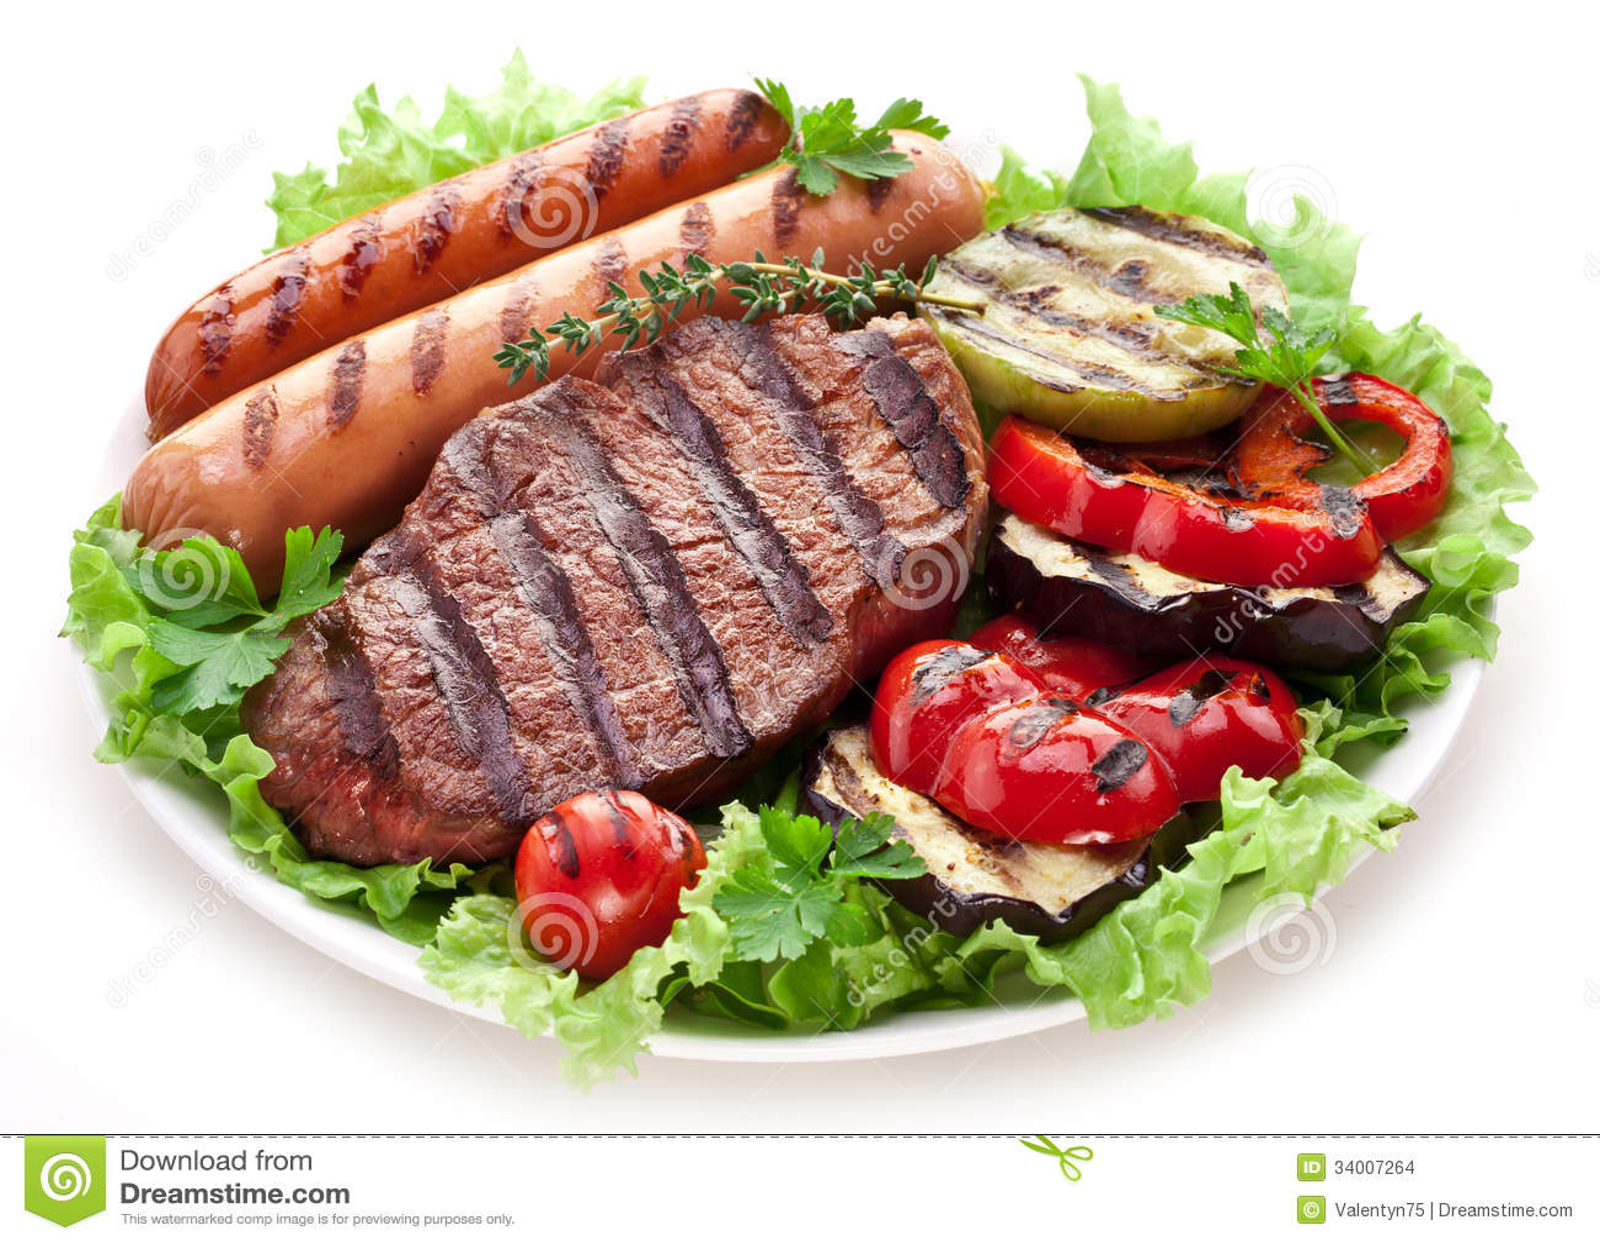 Grilled steak,sausages and vegetables.